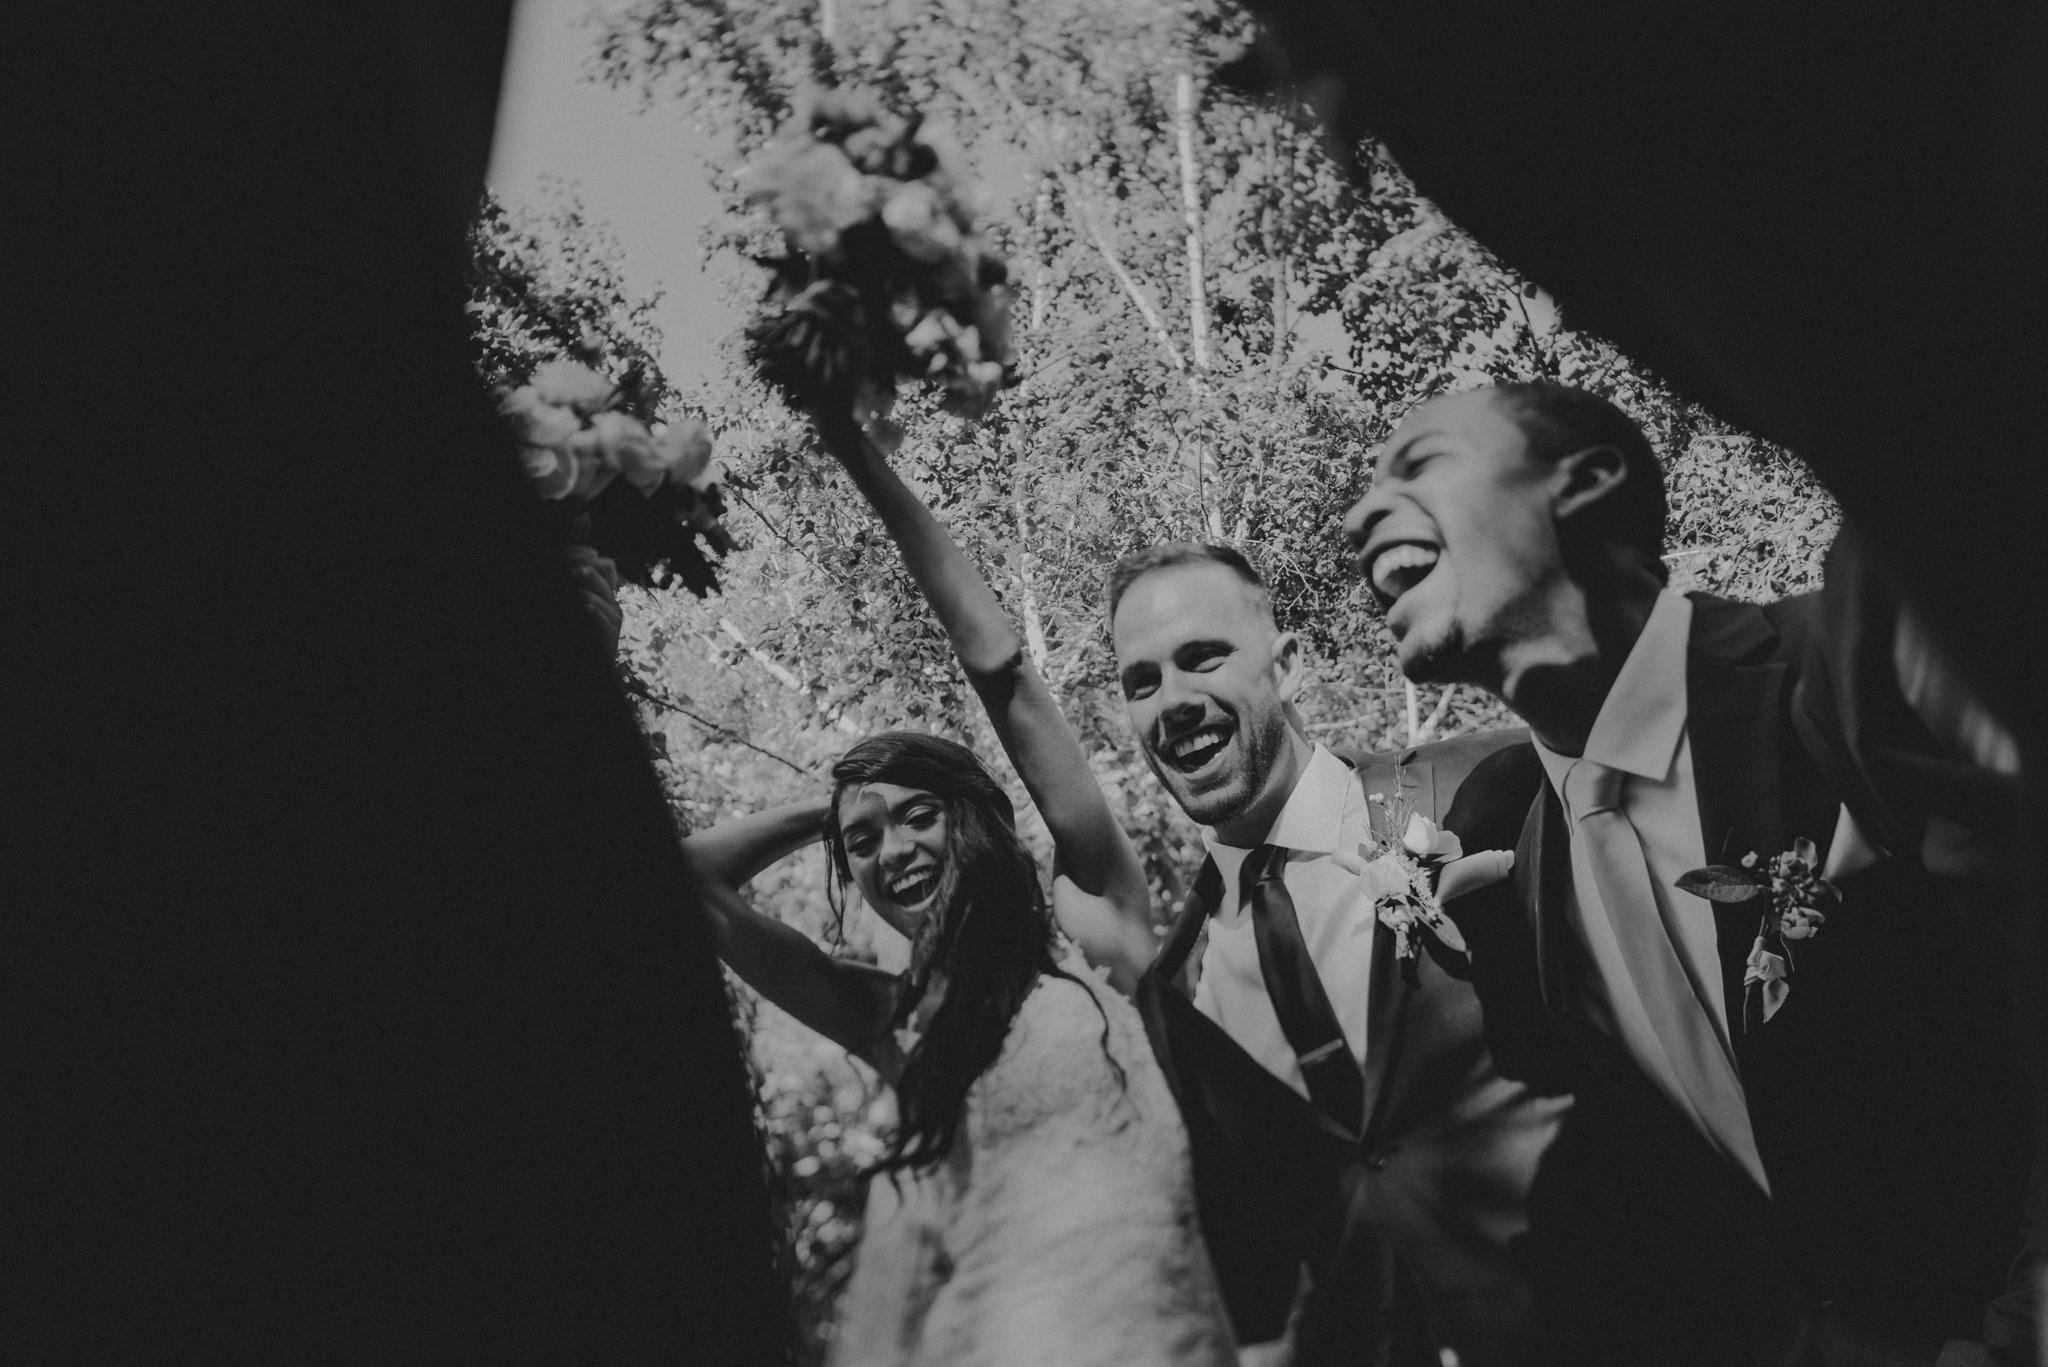 Isaiah + Taylor Photography - Rancho Las Lomas Wedding, Los Angeles Wedding Photographer-077.jpg